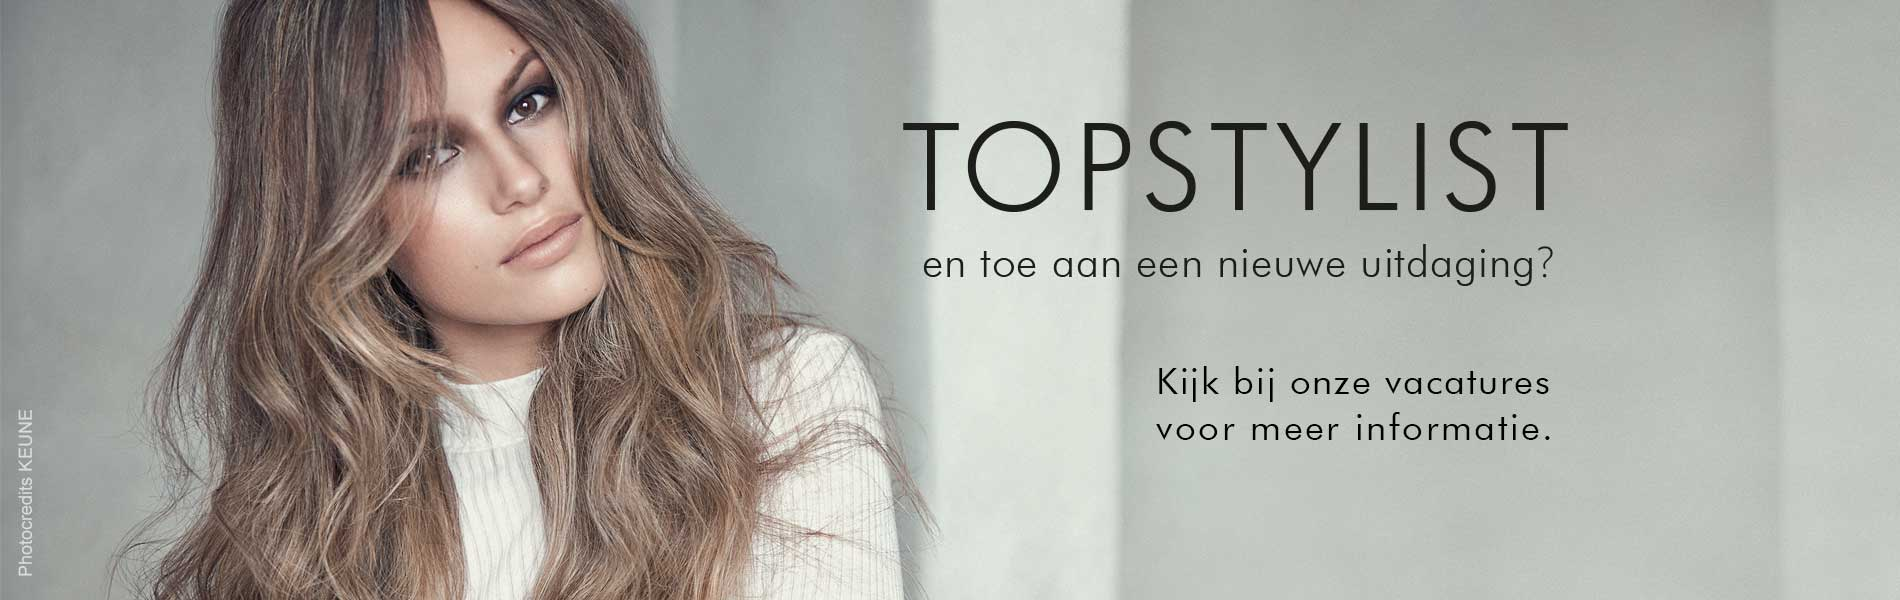 Knipoog Kapper | De Kapper In Dordrecht